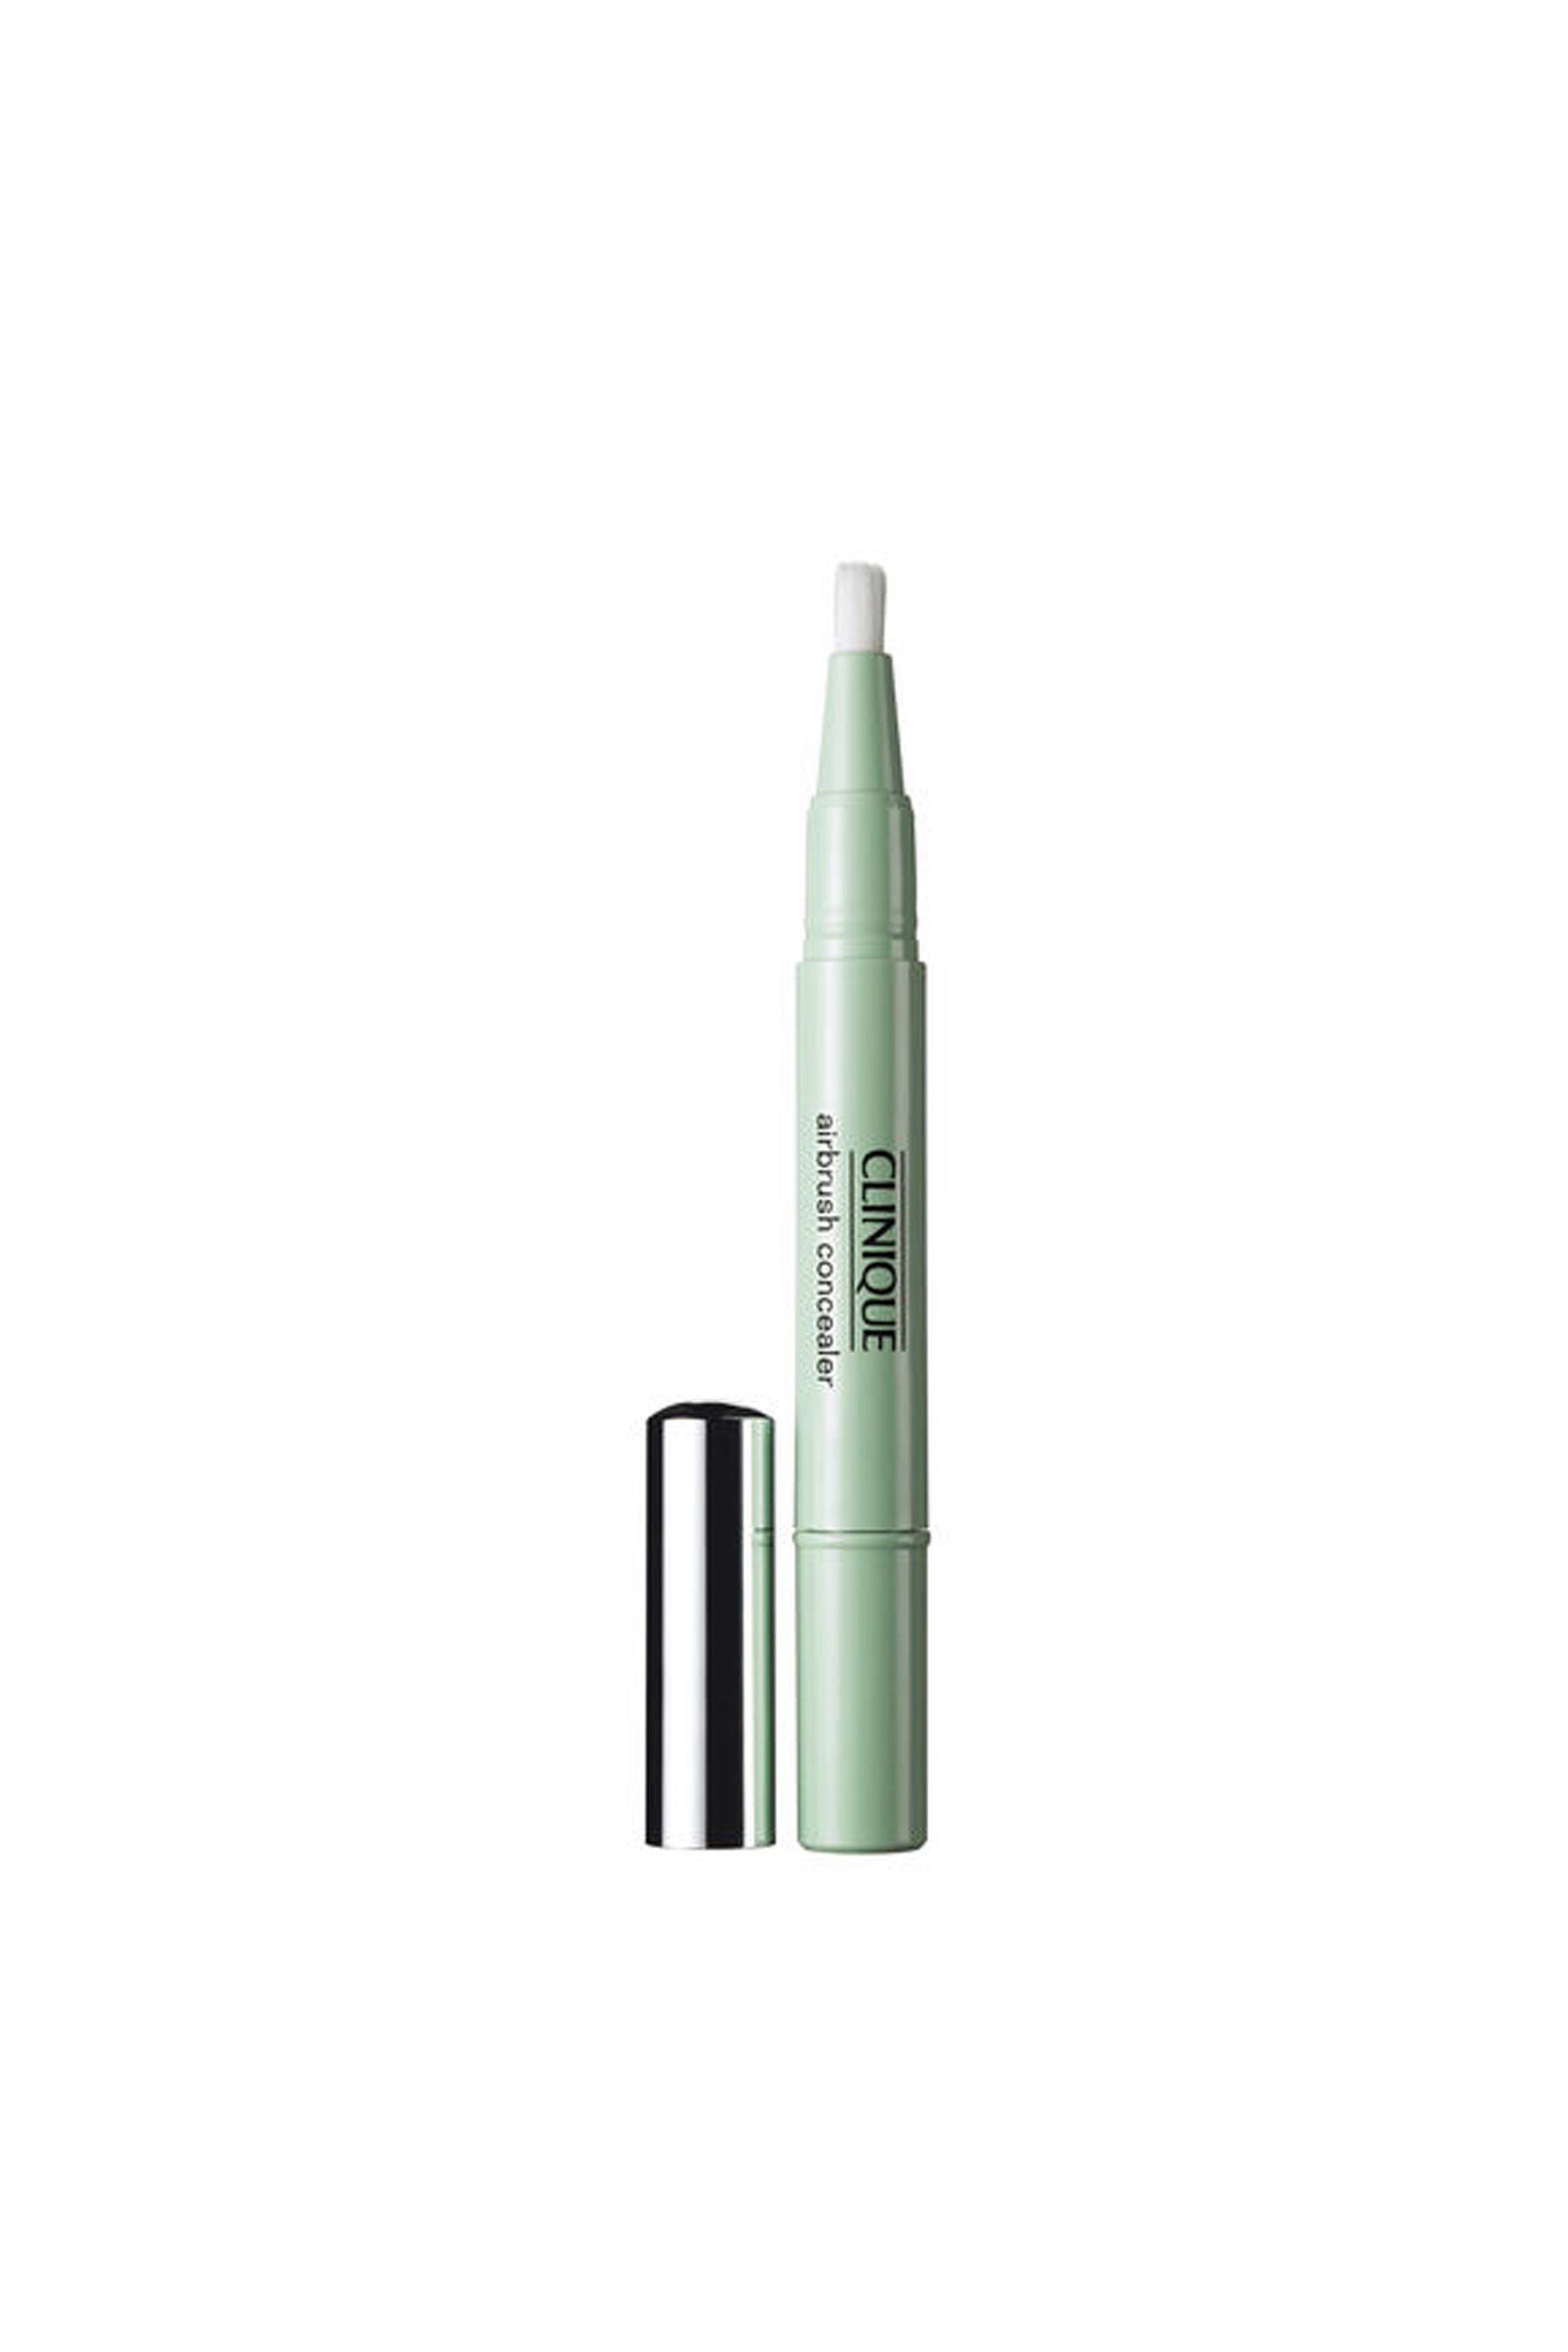 Clinique Airbrush Concealer™ 02 Medium 1.5 ml - 6CM2020000 ομορφια   καλλυντικα επιλεκτικησ   μακιγιάζ   πρόσωπο   concealers